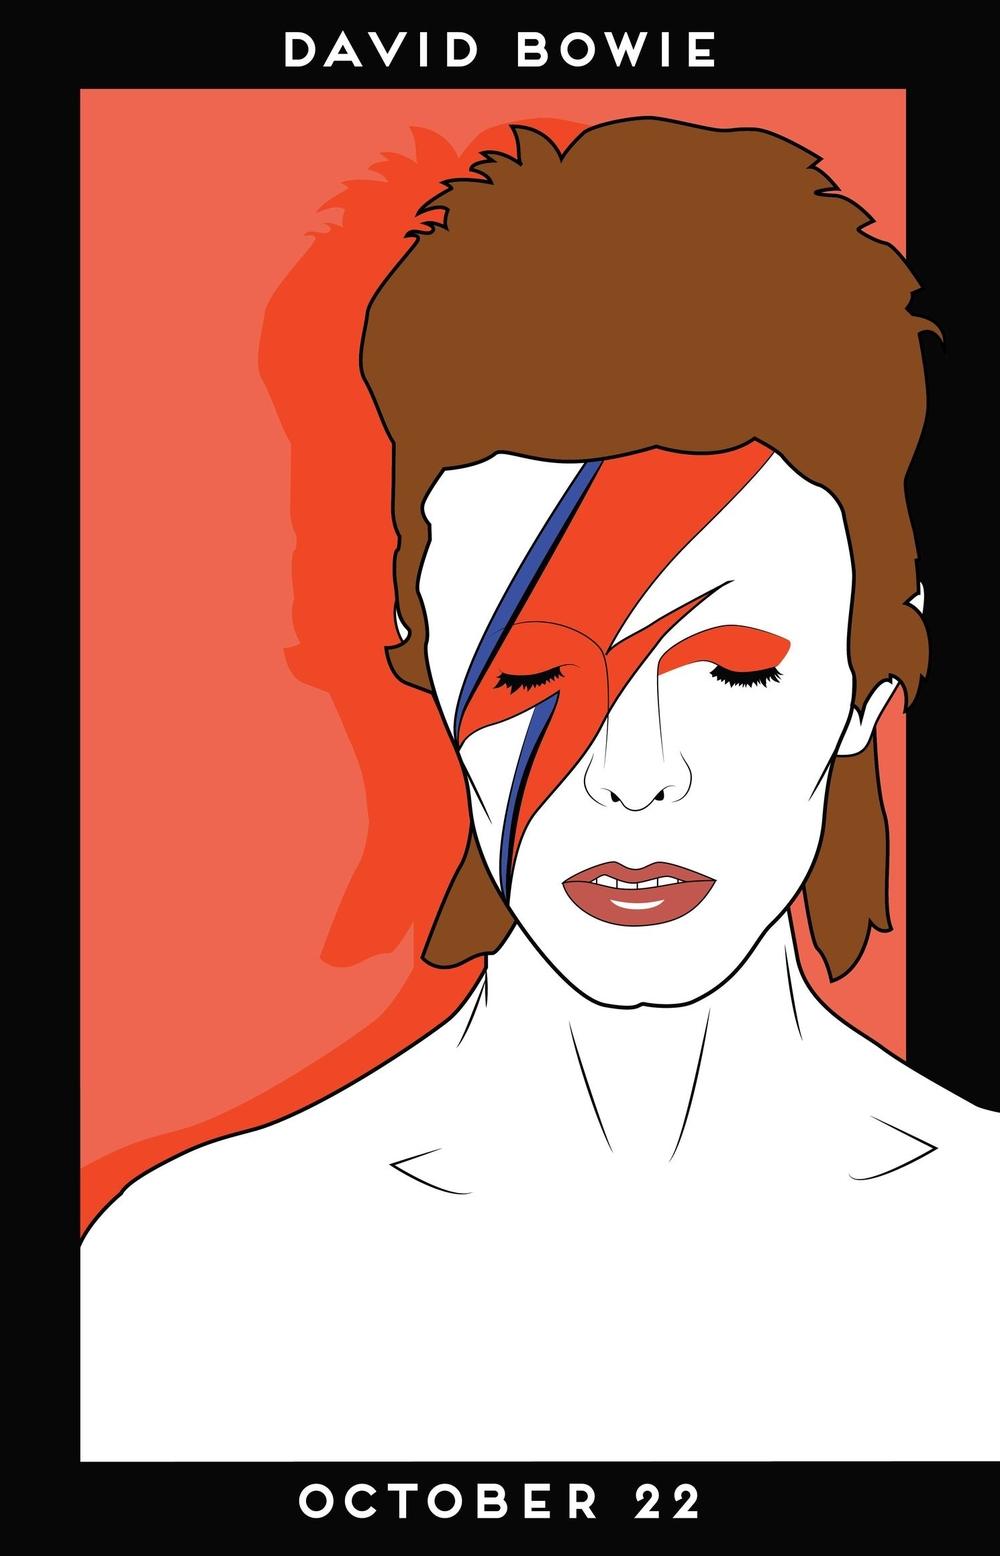 80s Pop Design inspired poster. Vector illustration of David Bowie.